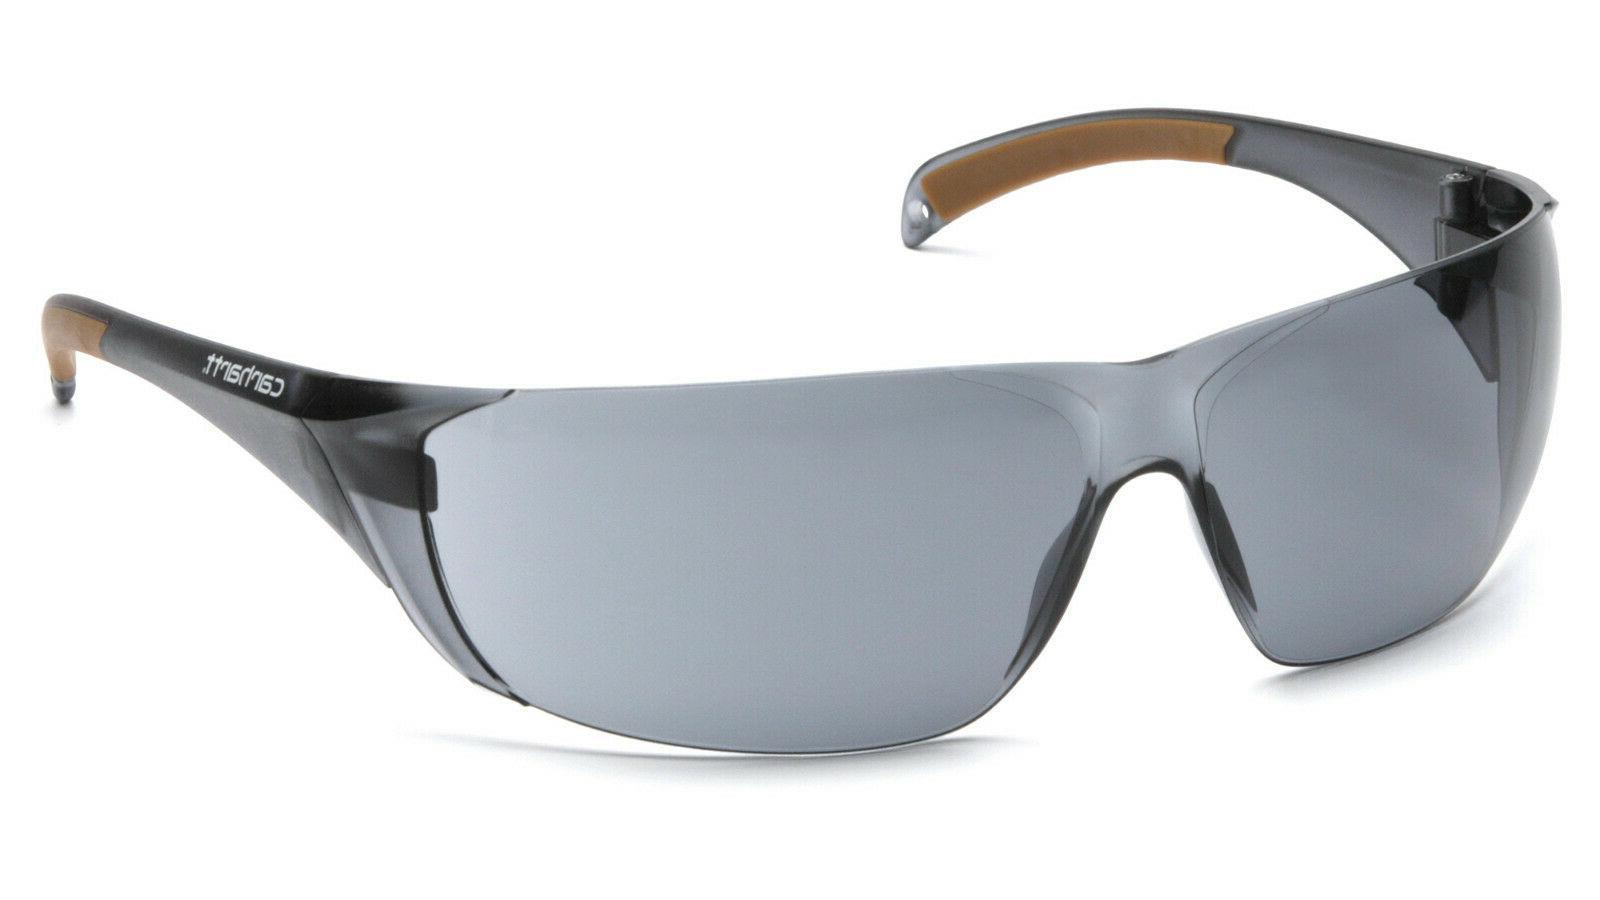 billings smoke gray anti fog safety glasses